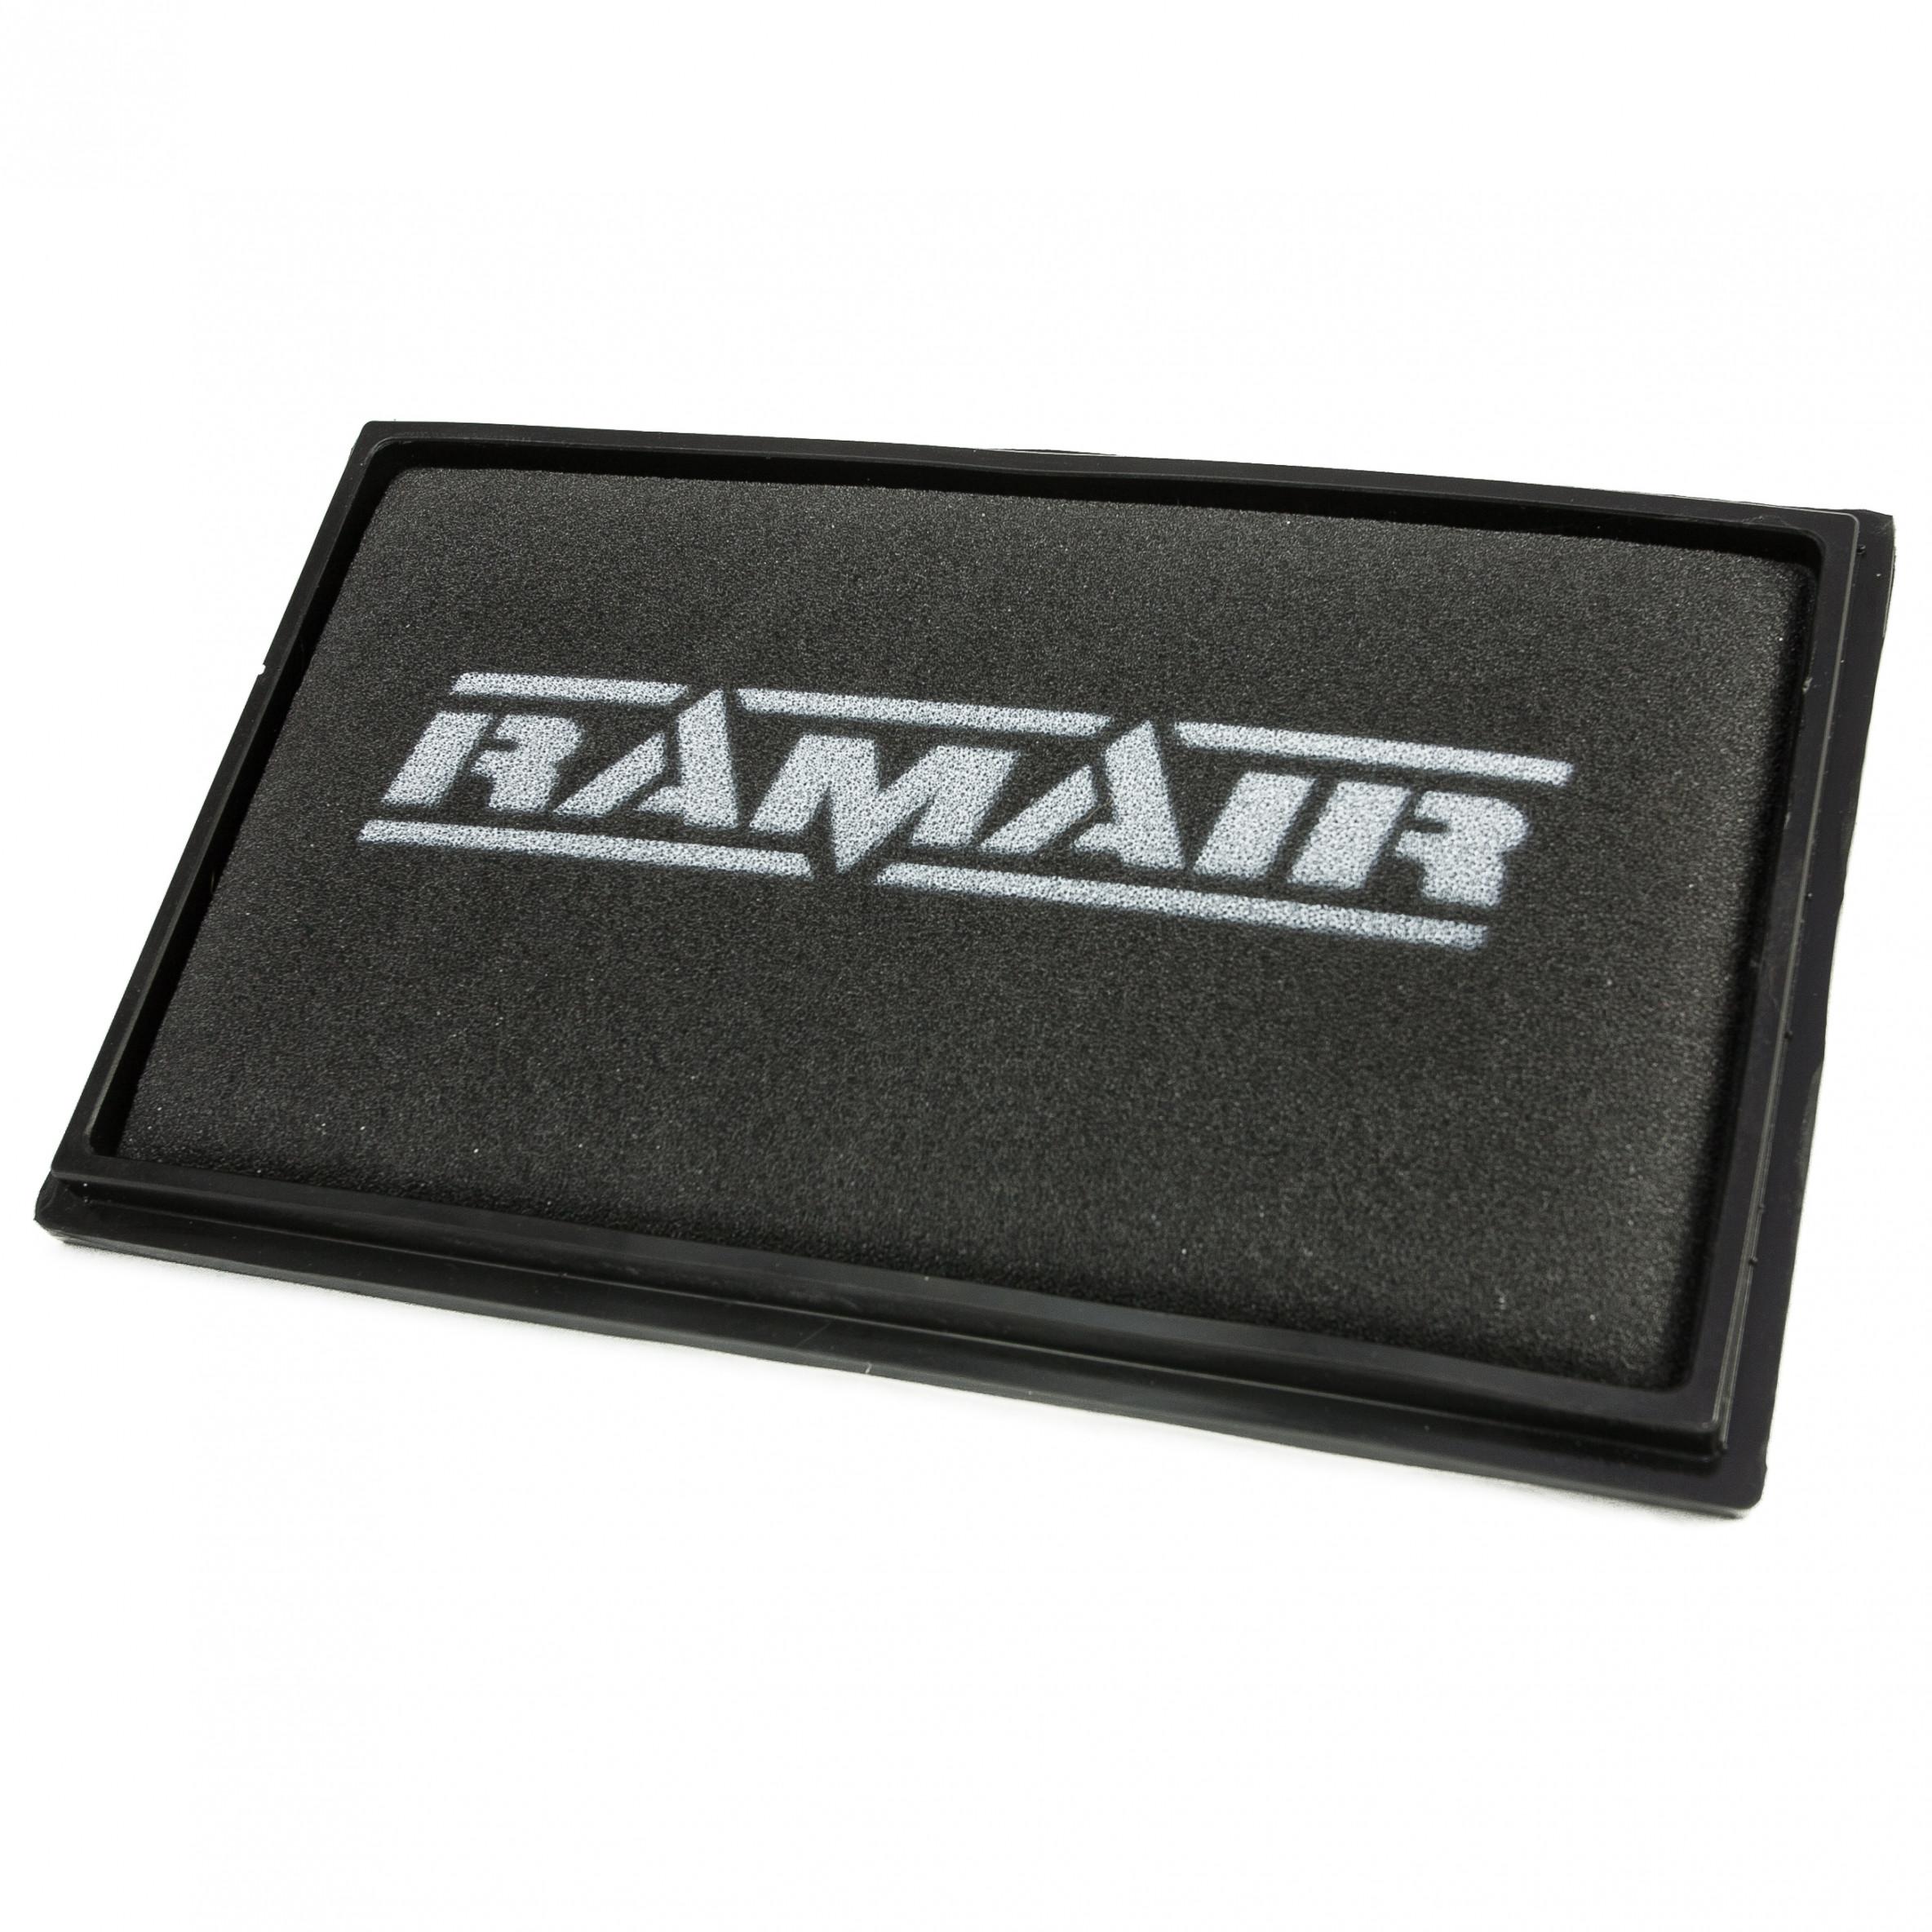 Ramair Filters RPF-1251 Foam Panel Air Filter